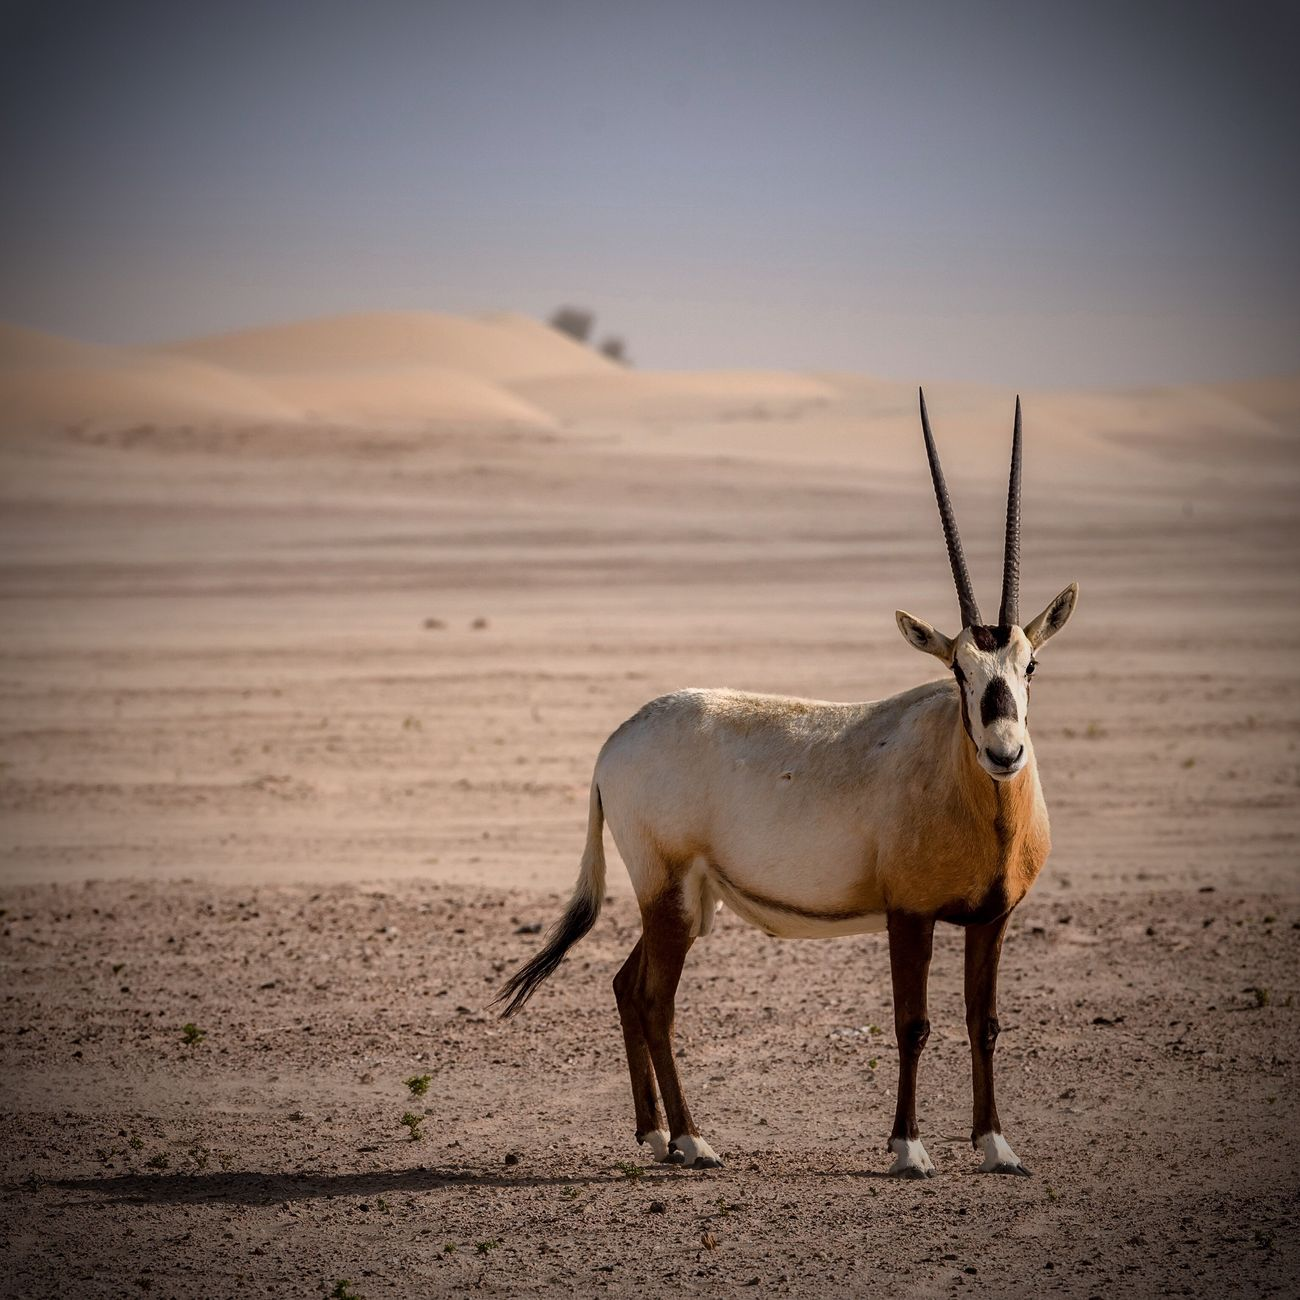 Wild Arabian Oryx seen in the Desert of Dubai United Arab Emirates Animal Themes One Animal Mammal Animals In The Wild Nature No People Animal Wildlife Wwf Oryx Antelope Gazelle Pet Outdoors Day Beauty In Nature